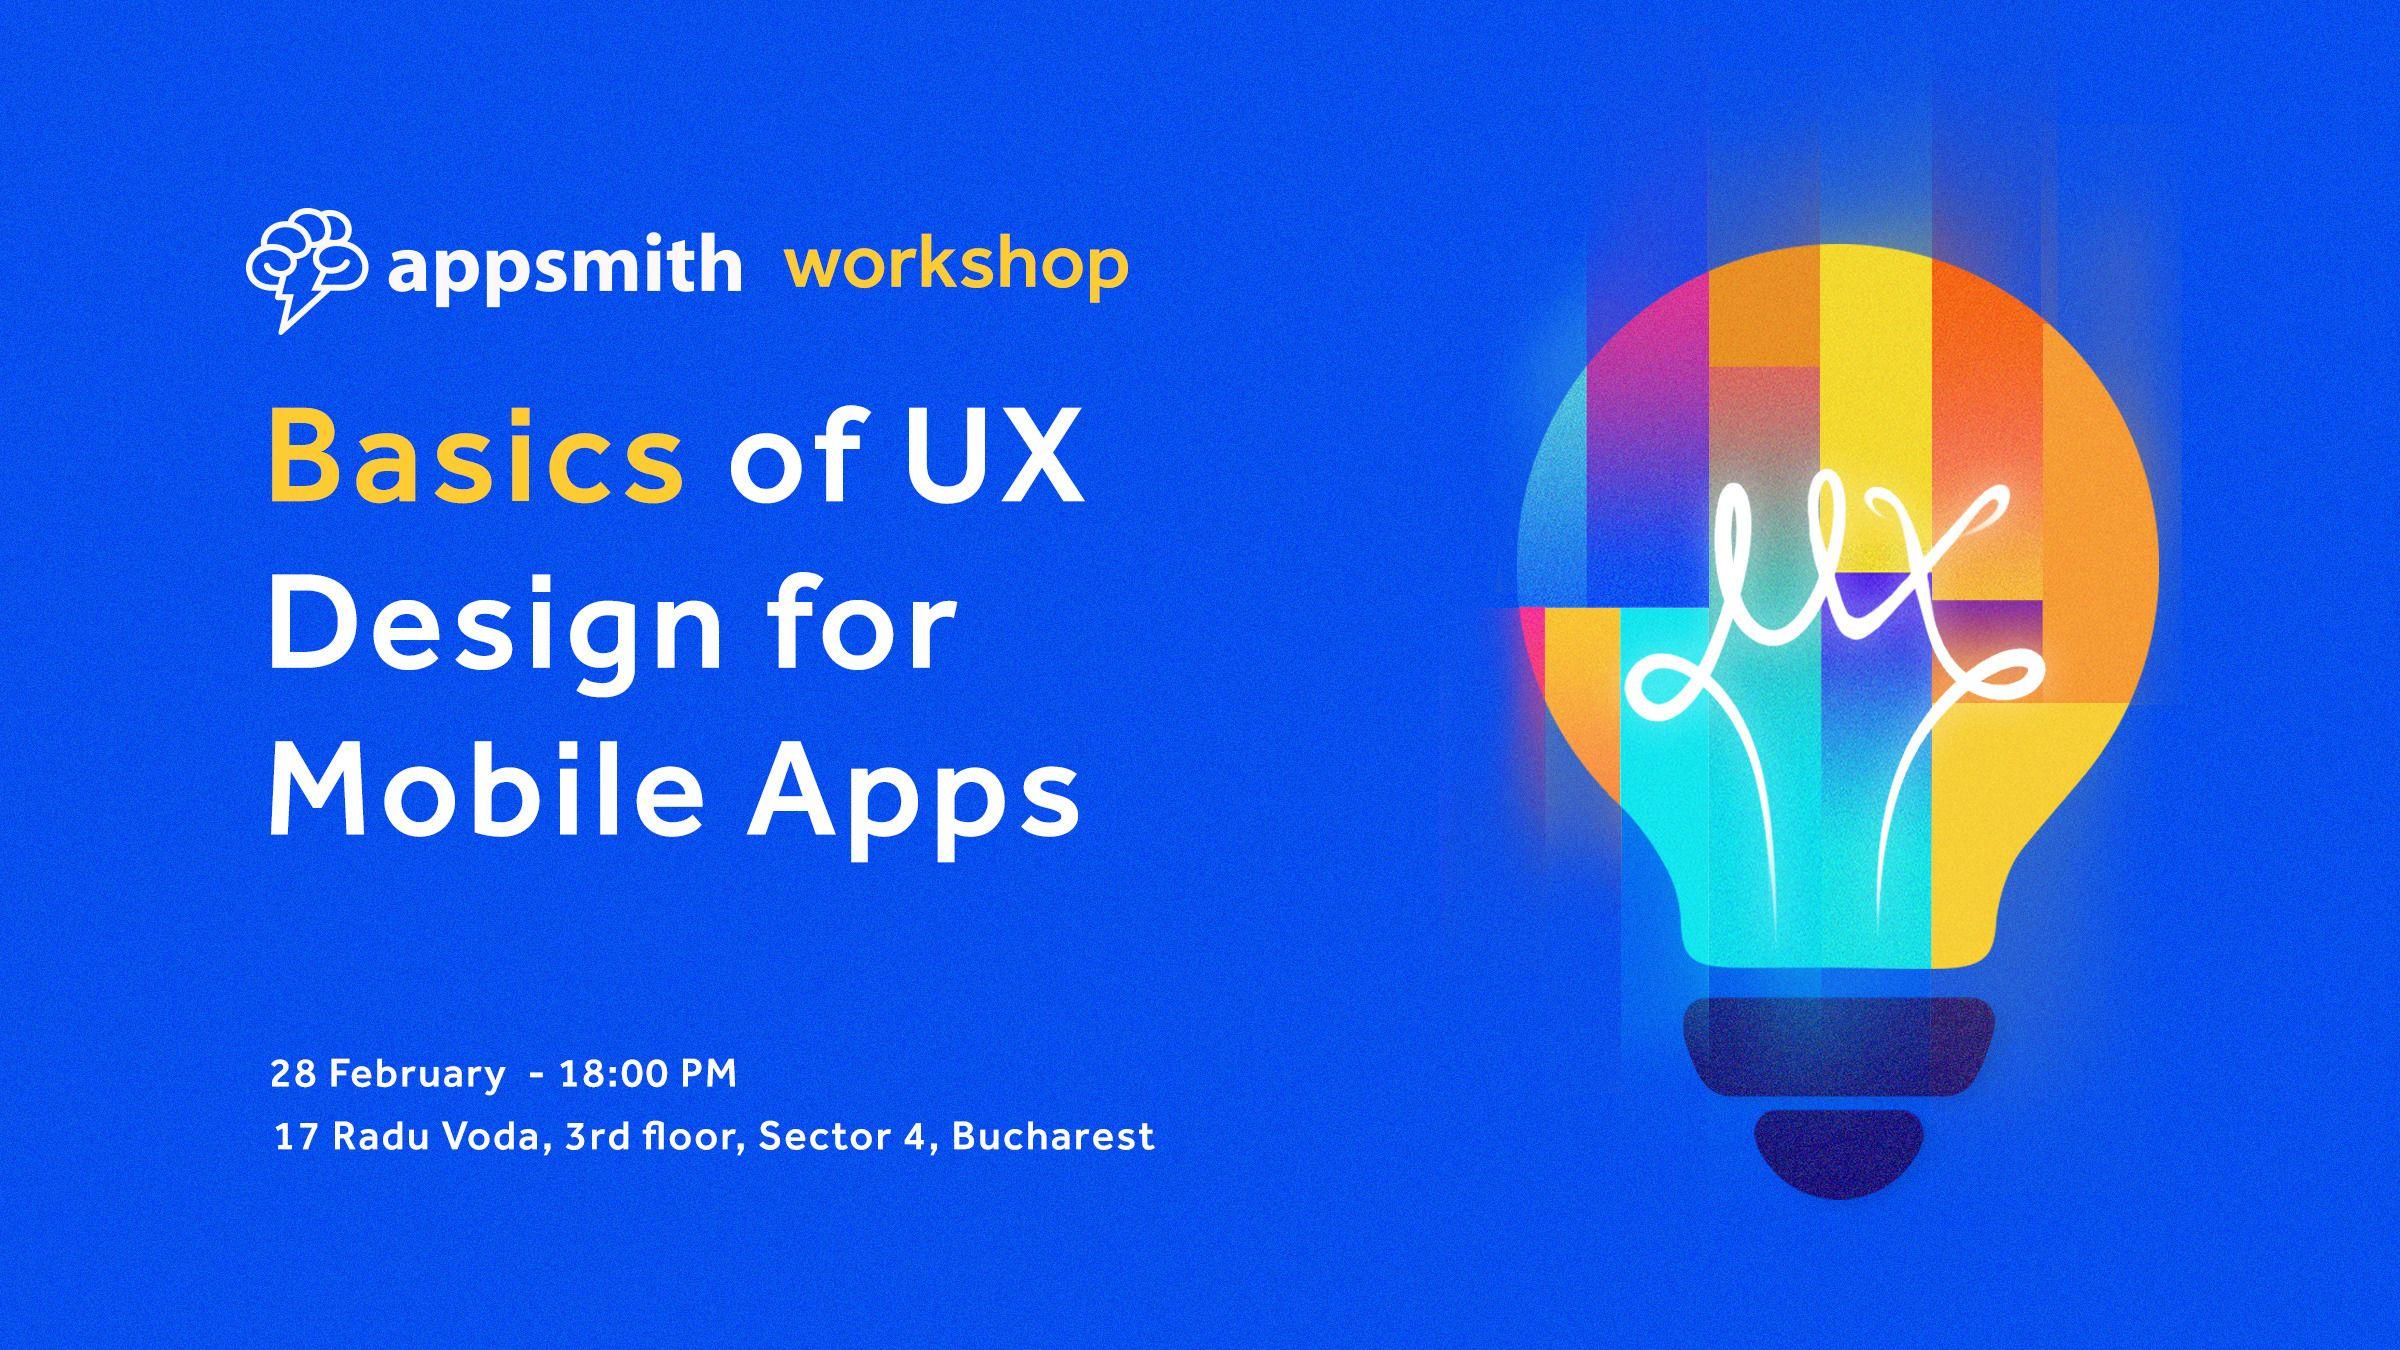 Basics of UX Design for Mobile Apps